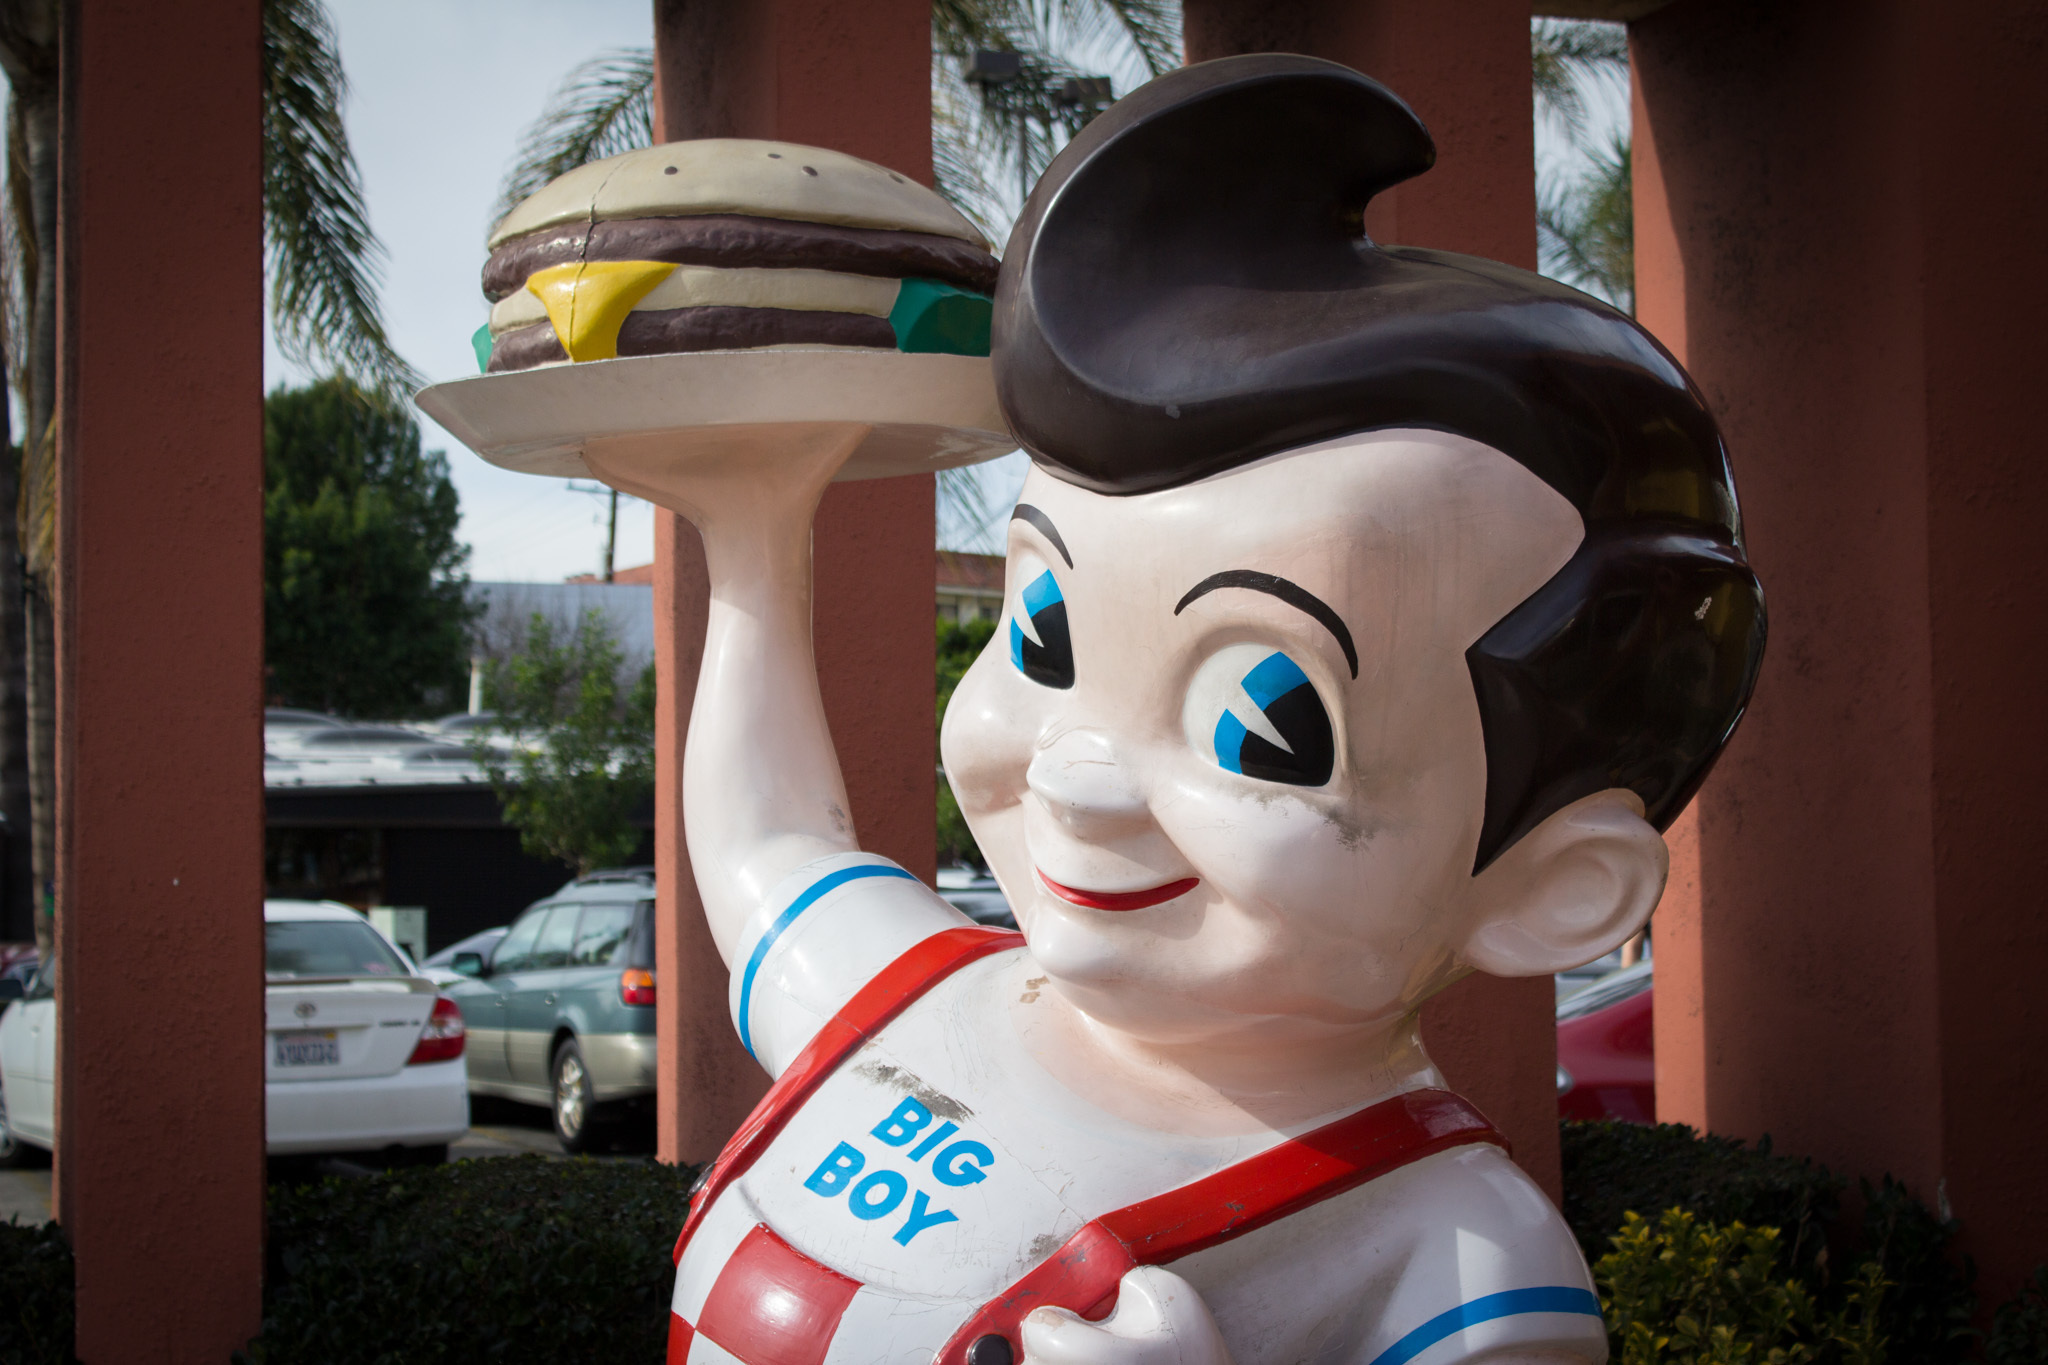 Bob's Big Boy